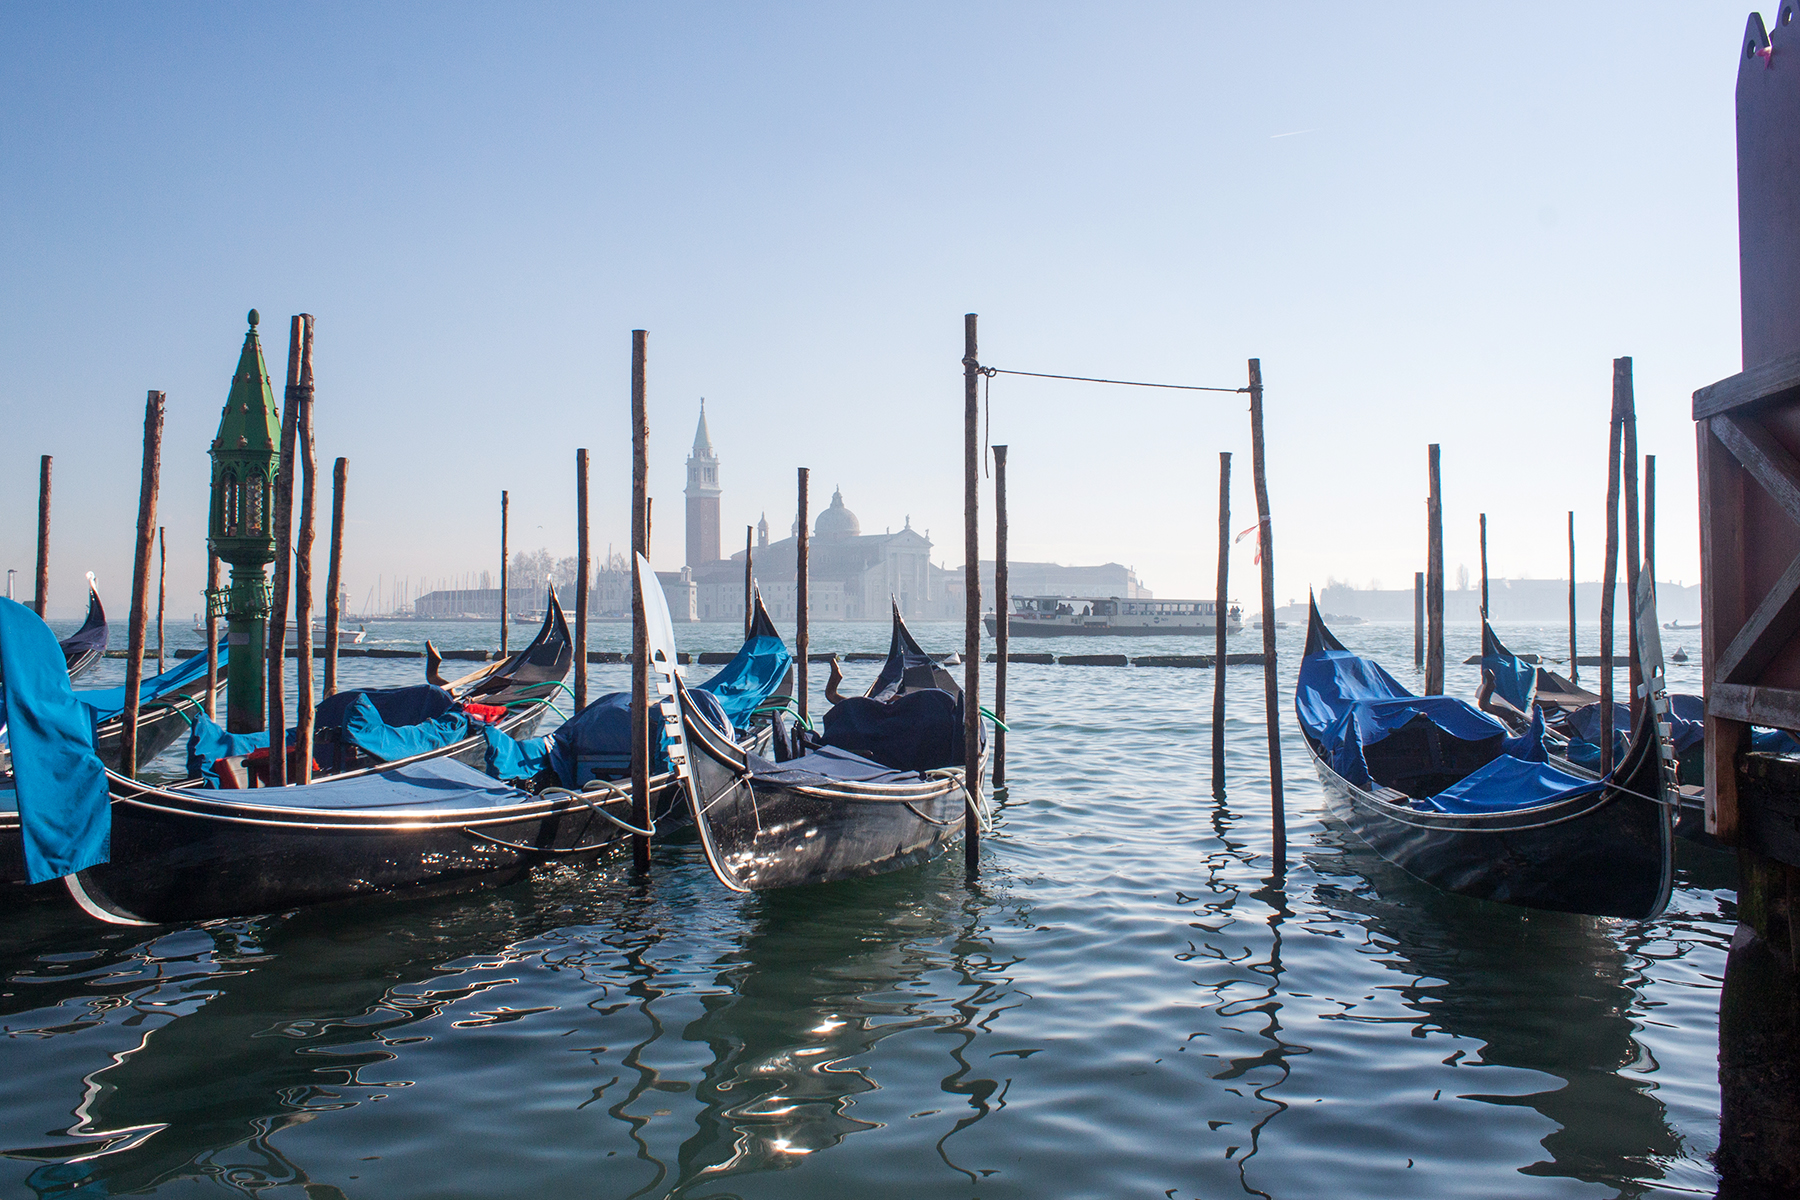 Streets of Venice, Parked Gondolas | lifeofkitty.co.uk